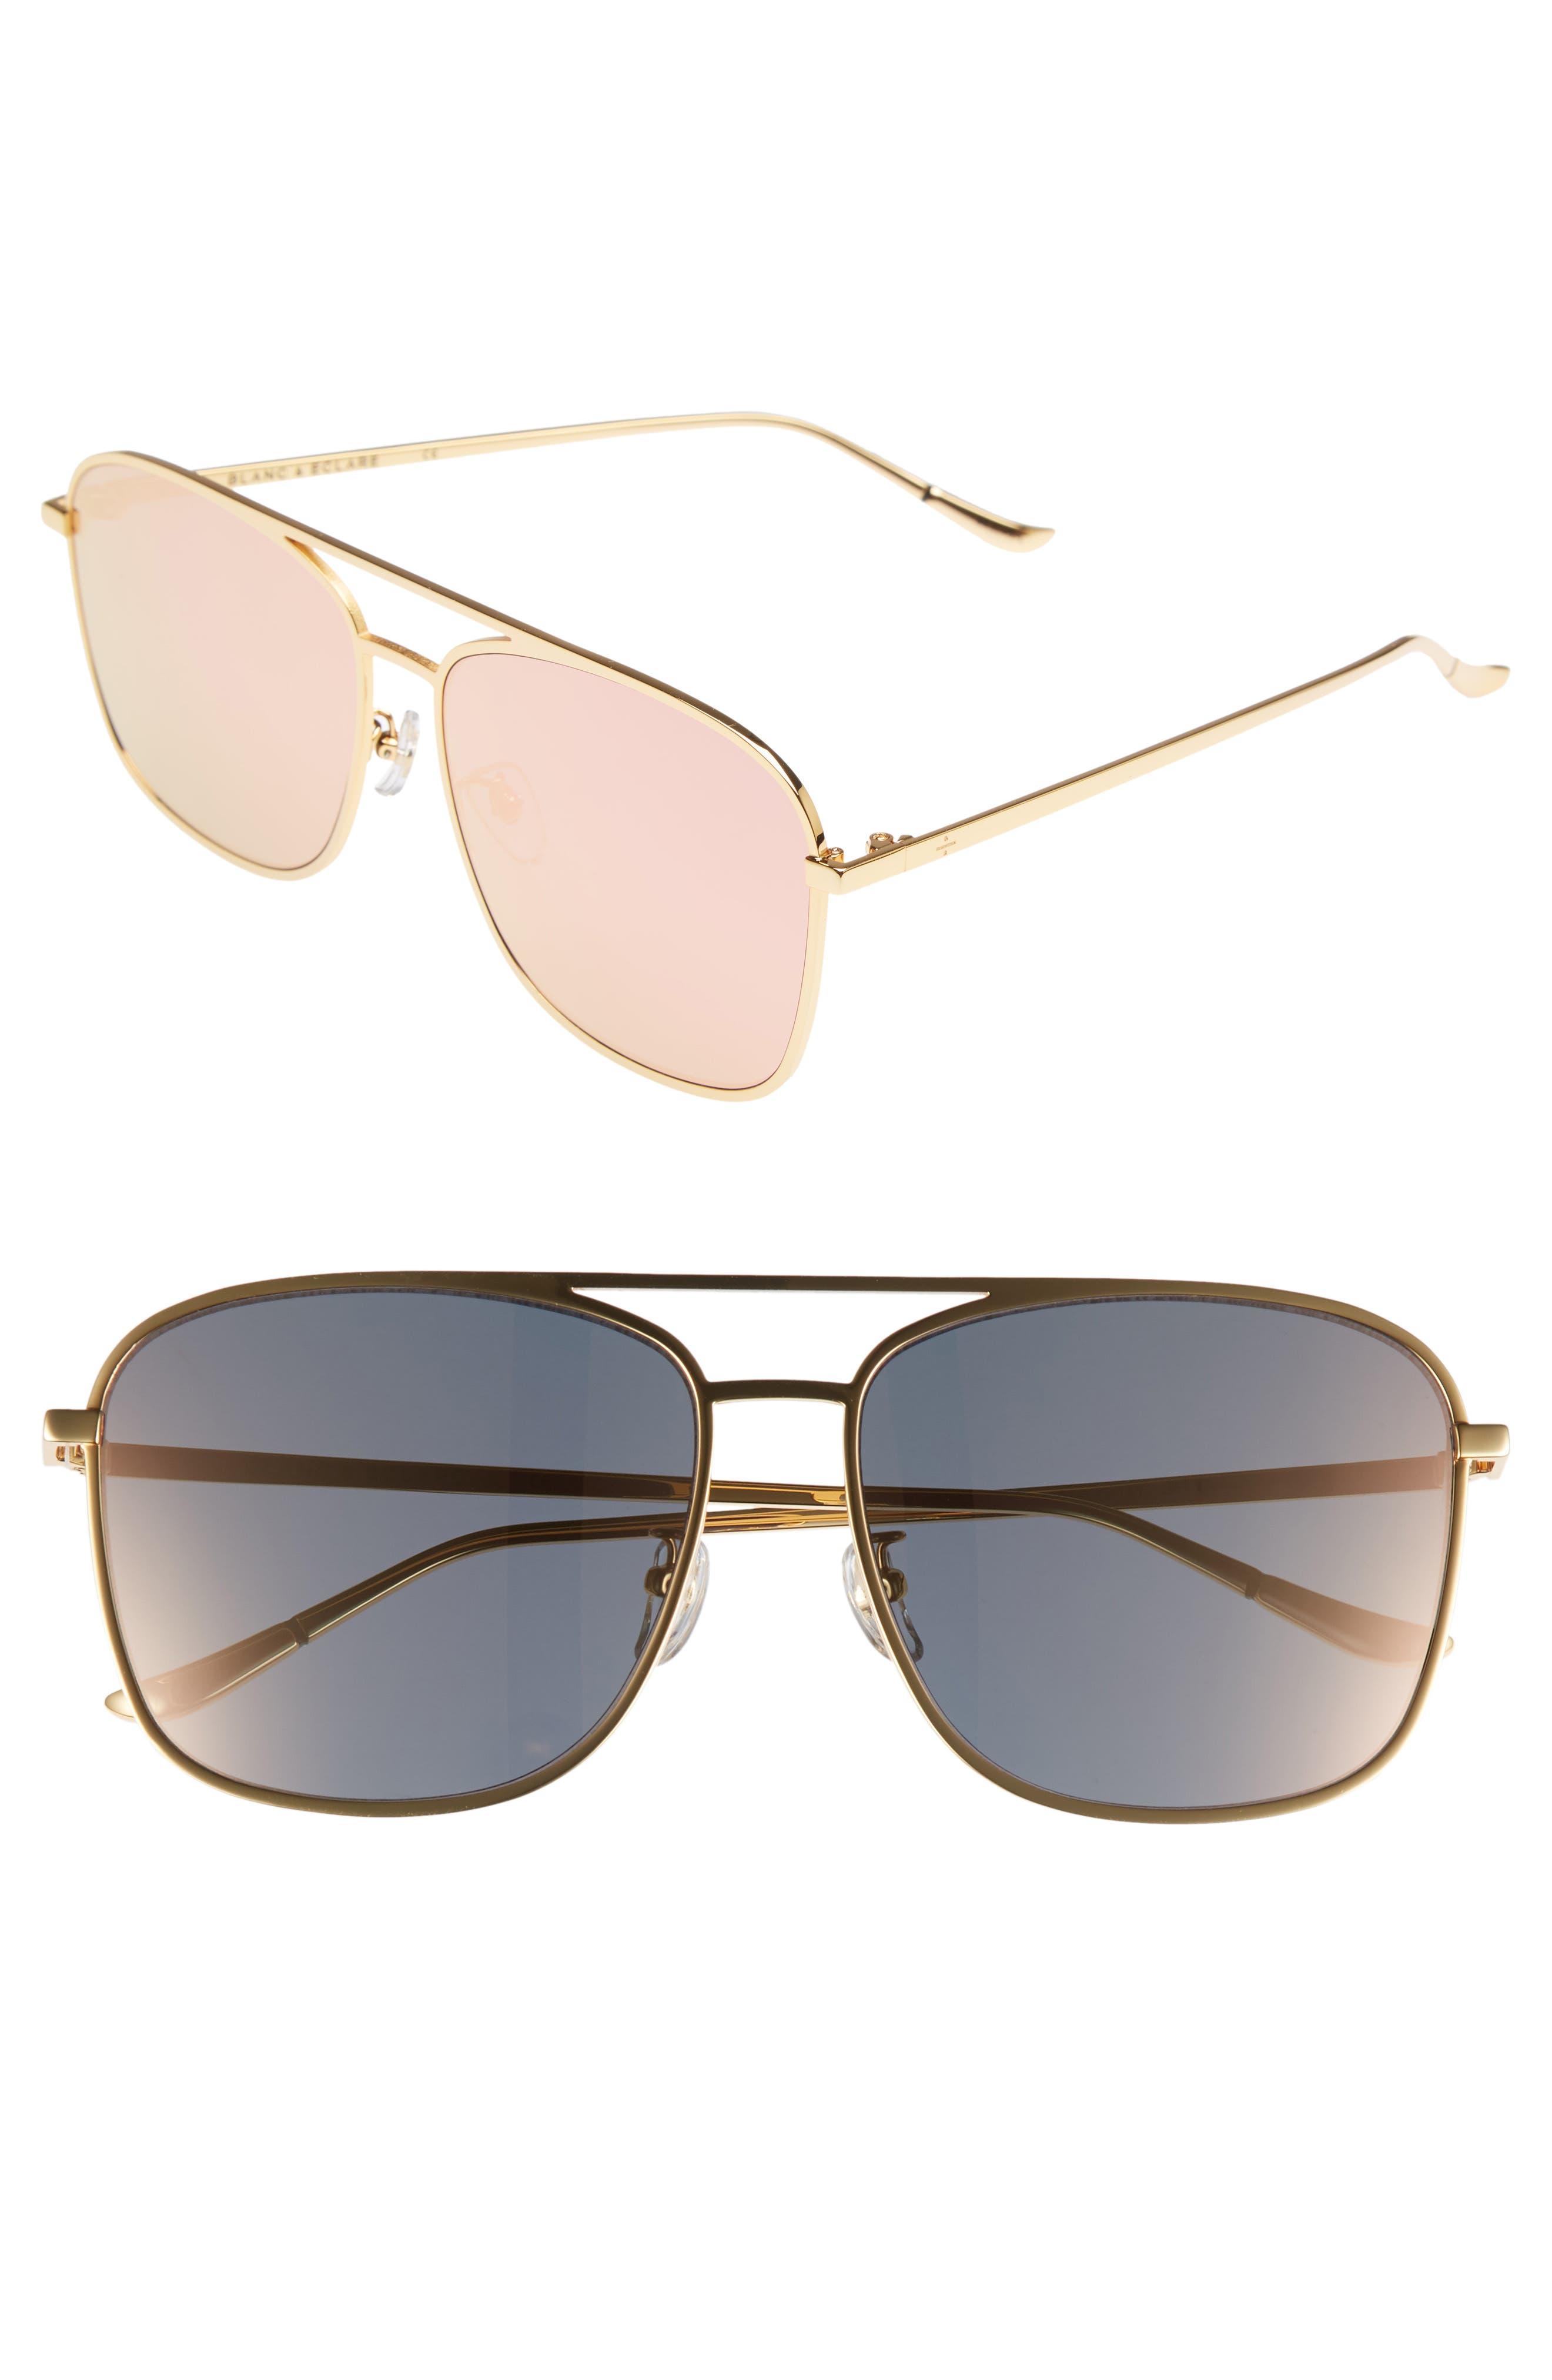 BLANC & ECLARE Geneva 61mm Large Polarized Metal Aviator Sunglasses,                             Main thumbnail 1, color,                             710